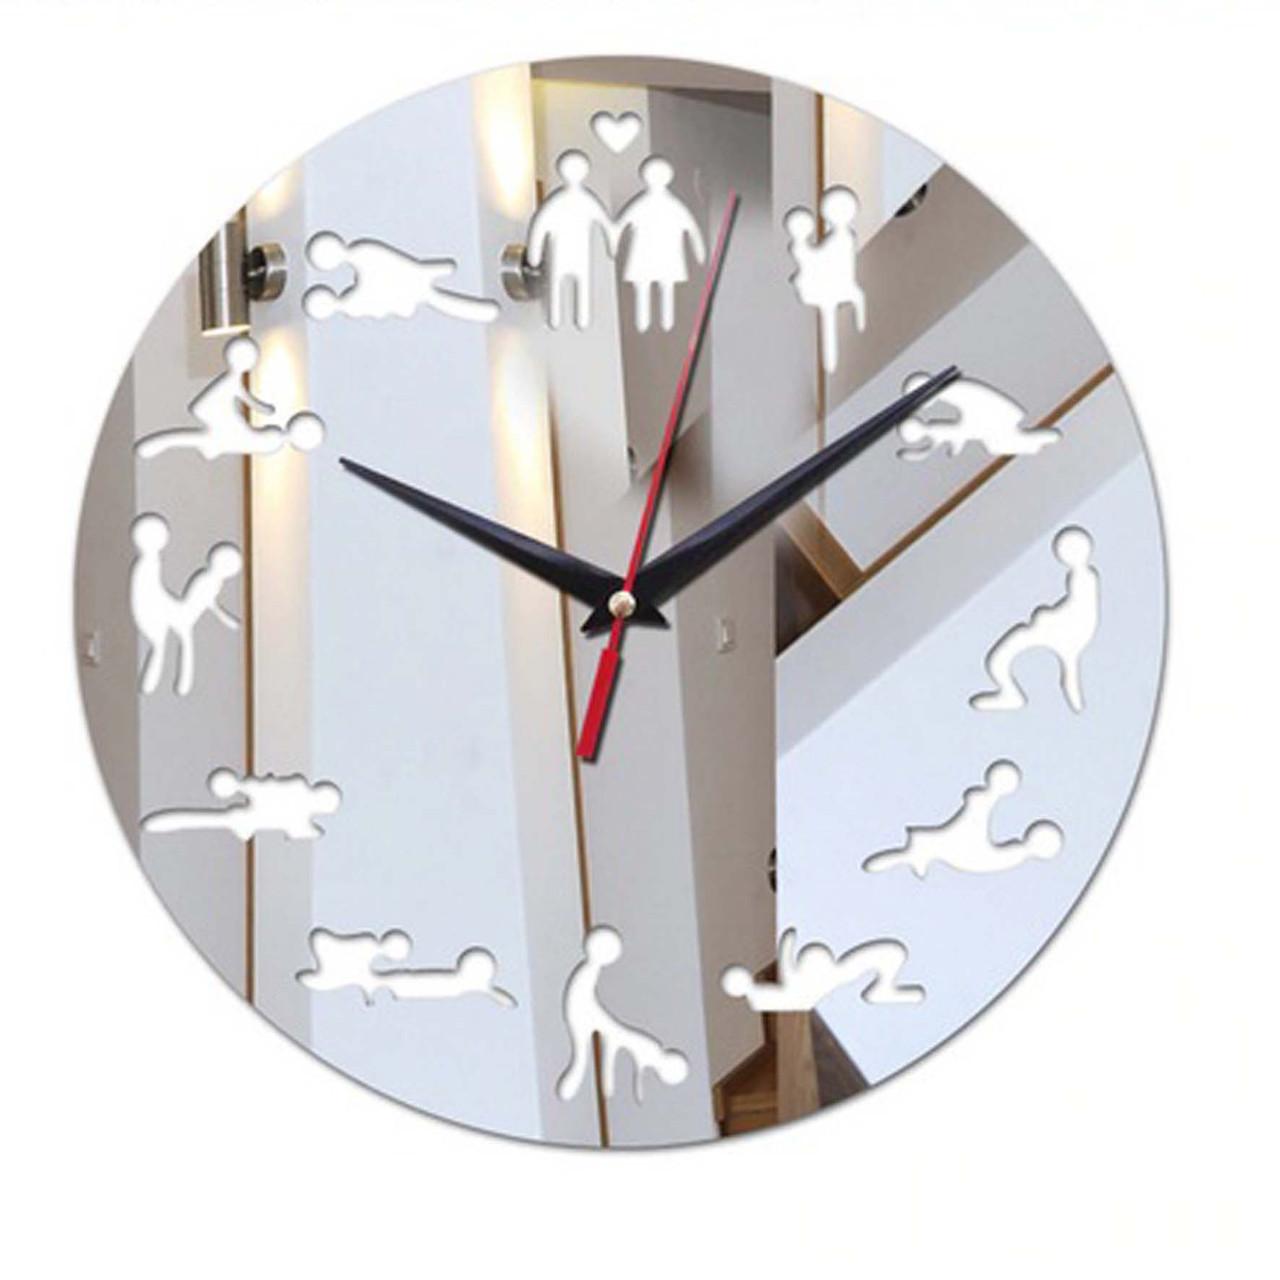 "Настінні 3D годинник з дзеркальним ефектом "" ХХХ """